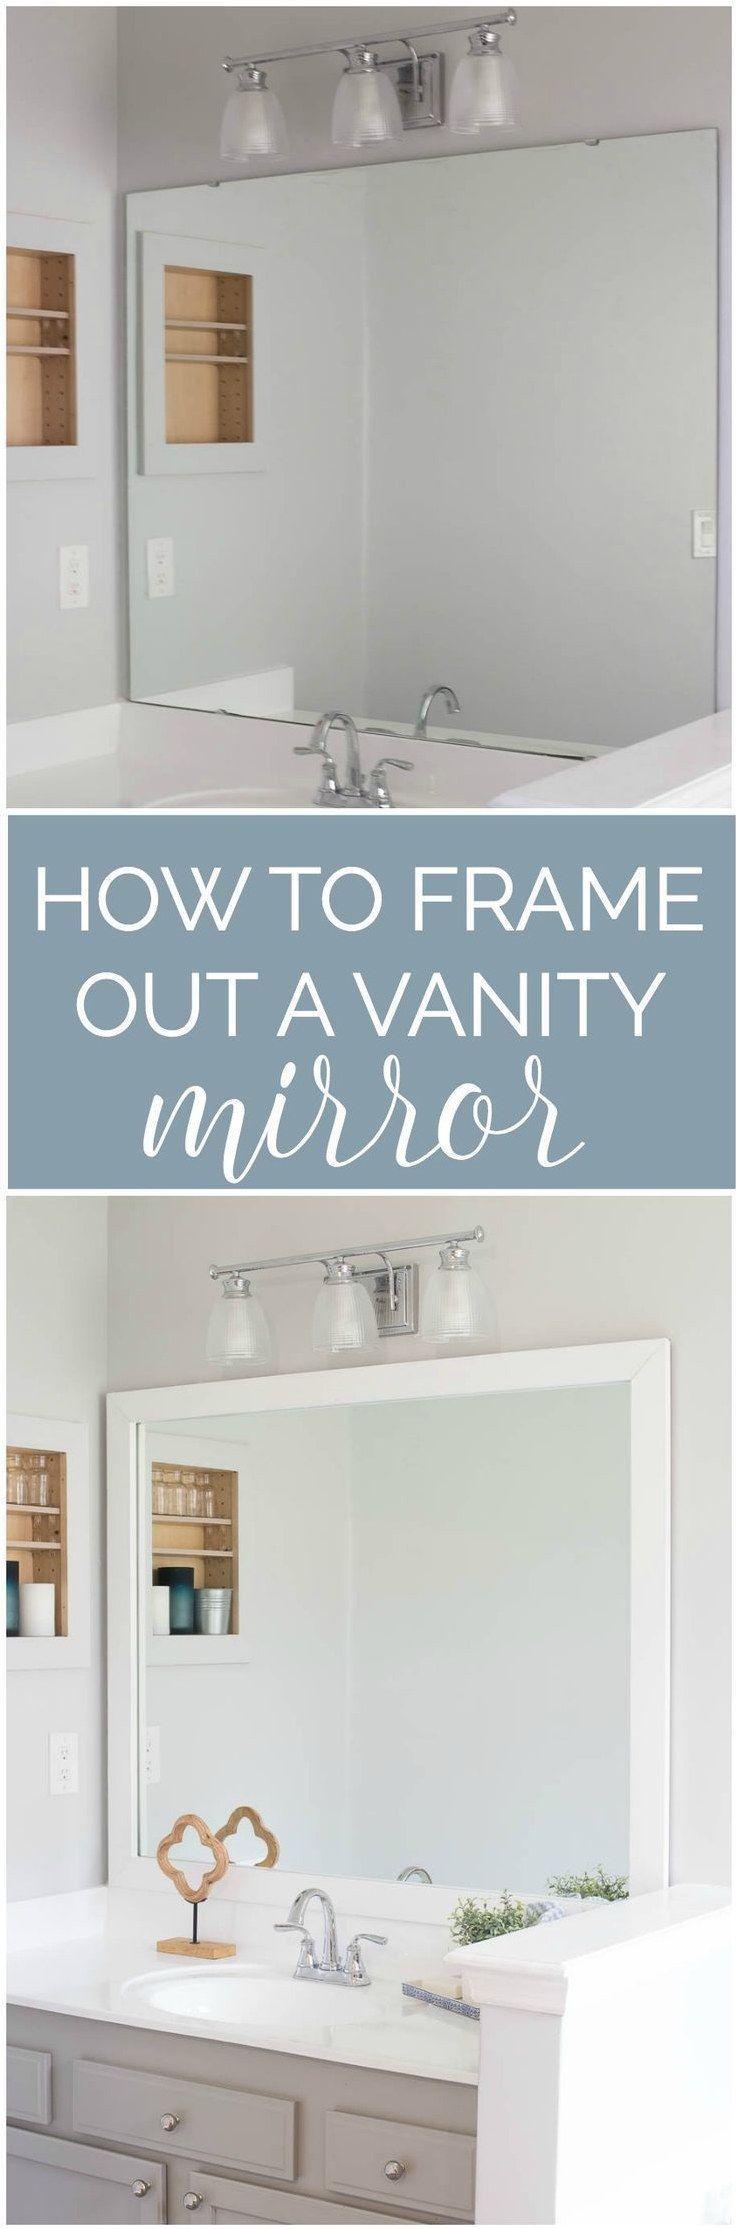 Farmhouse Bathroom Mirror by Cherished Bliss | DIY Farmhouse Decor ...